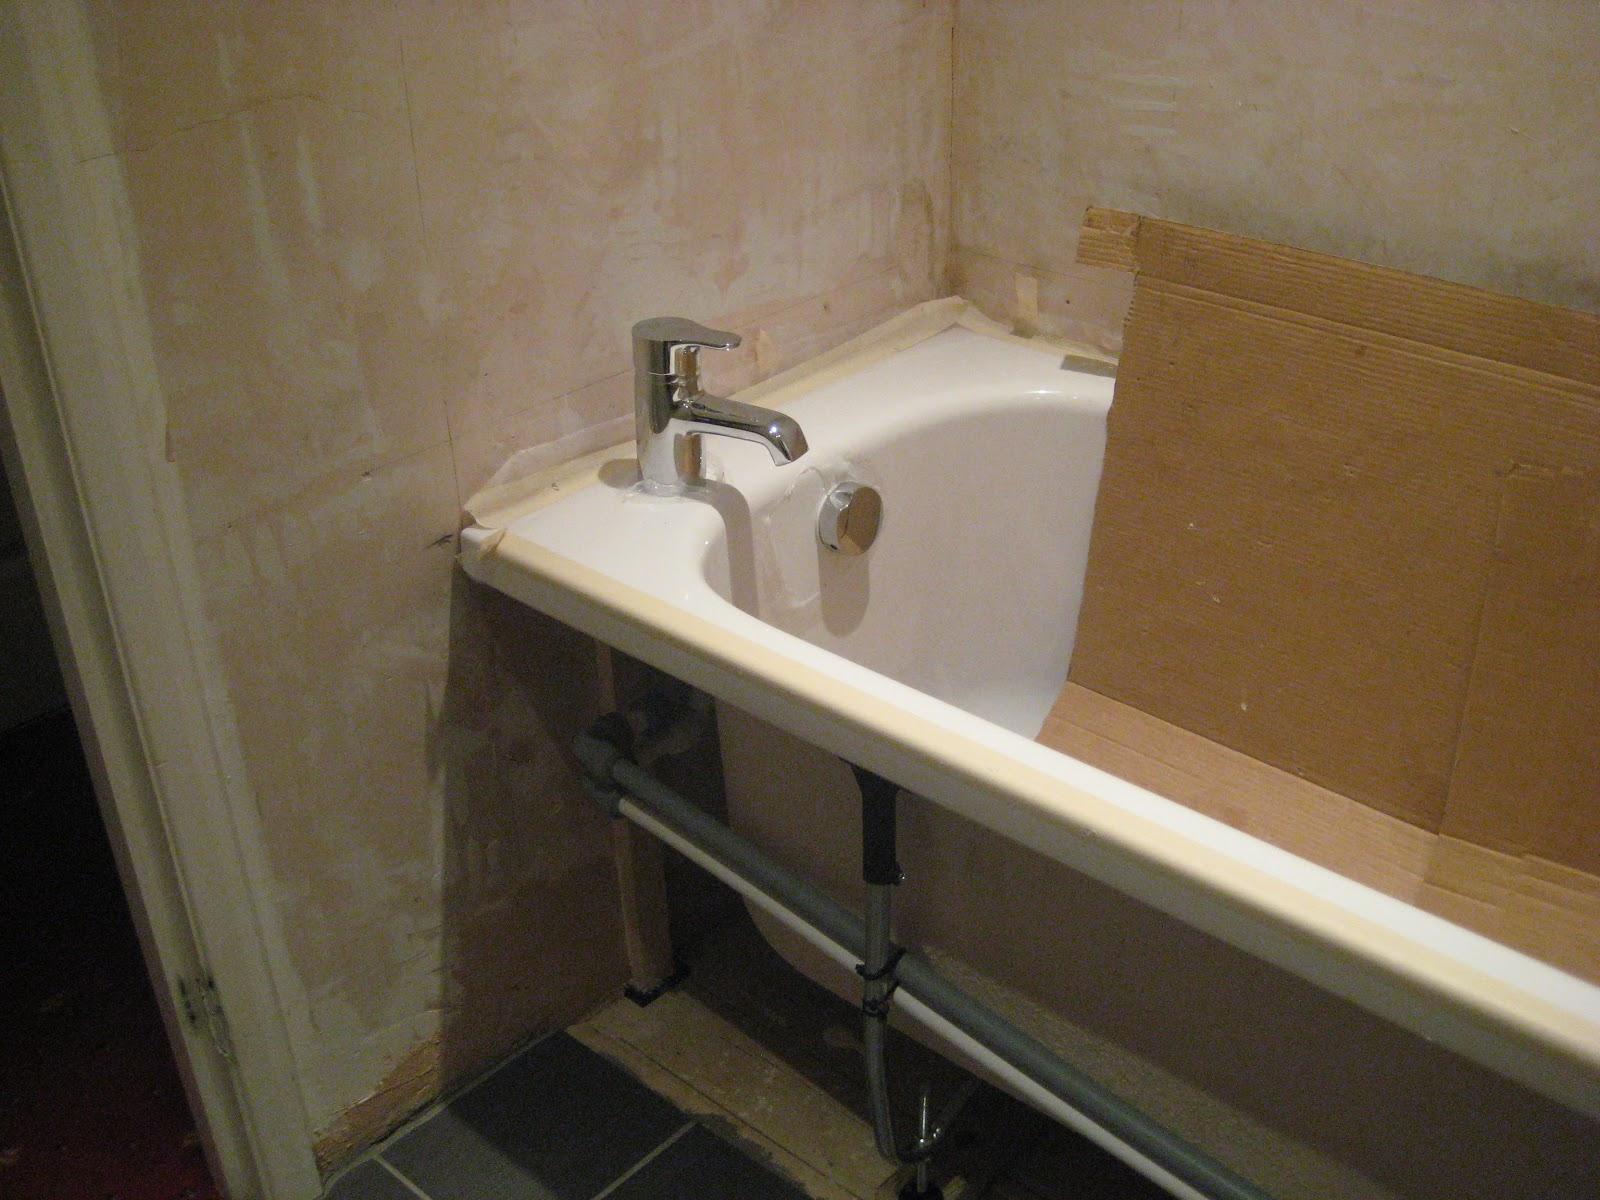 Interior Design Inspiration - Ramblings From My Sofa: Bathroom ...